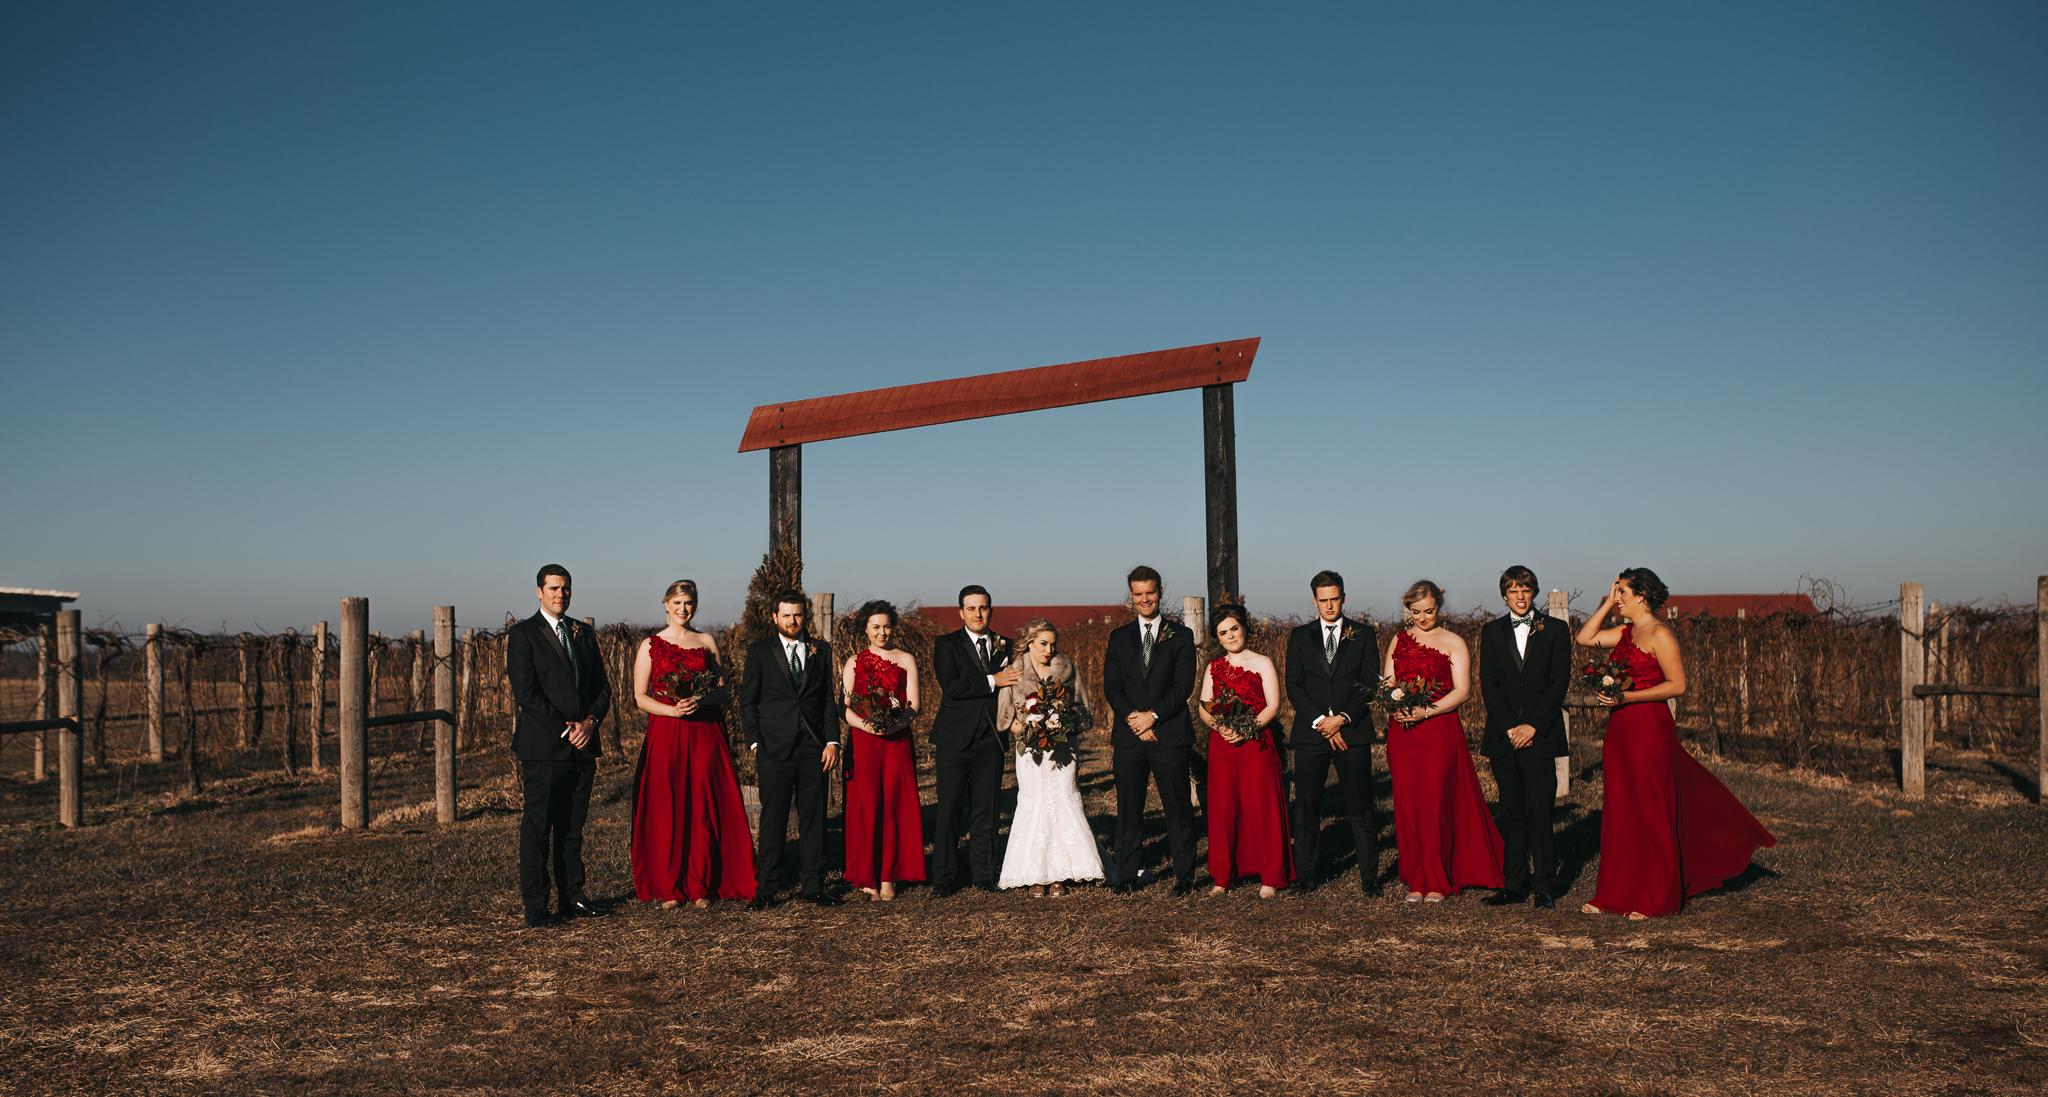 0082 Ariana Jordan Photo - Cameron & Lauren's Wedding at Talon Winery _.jpg